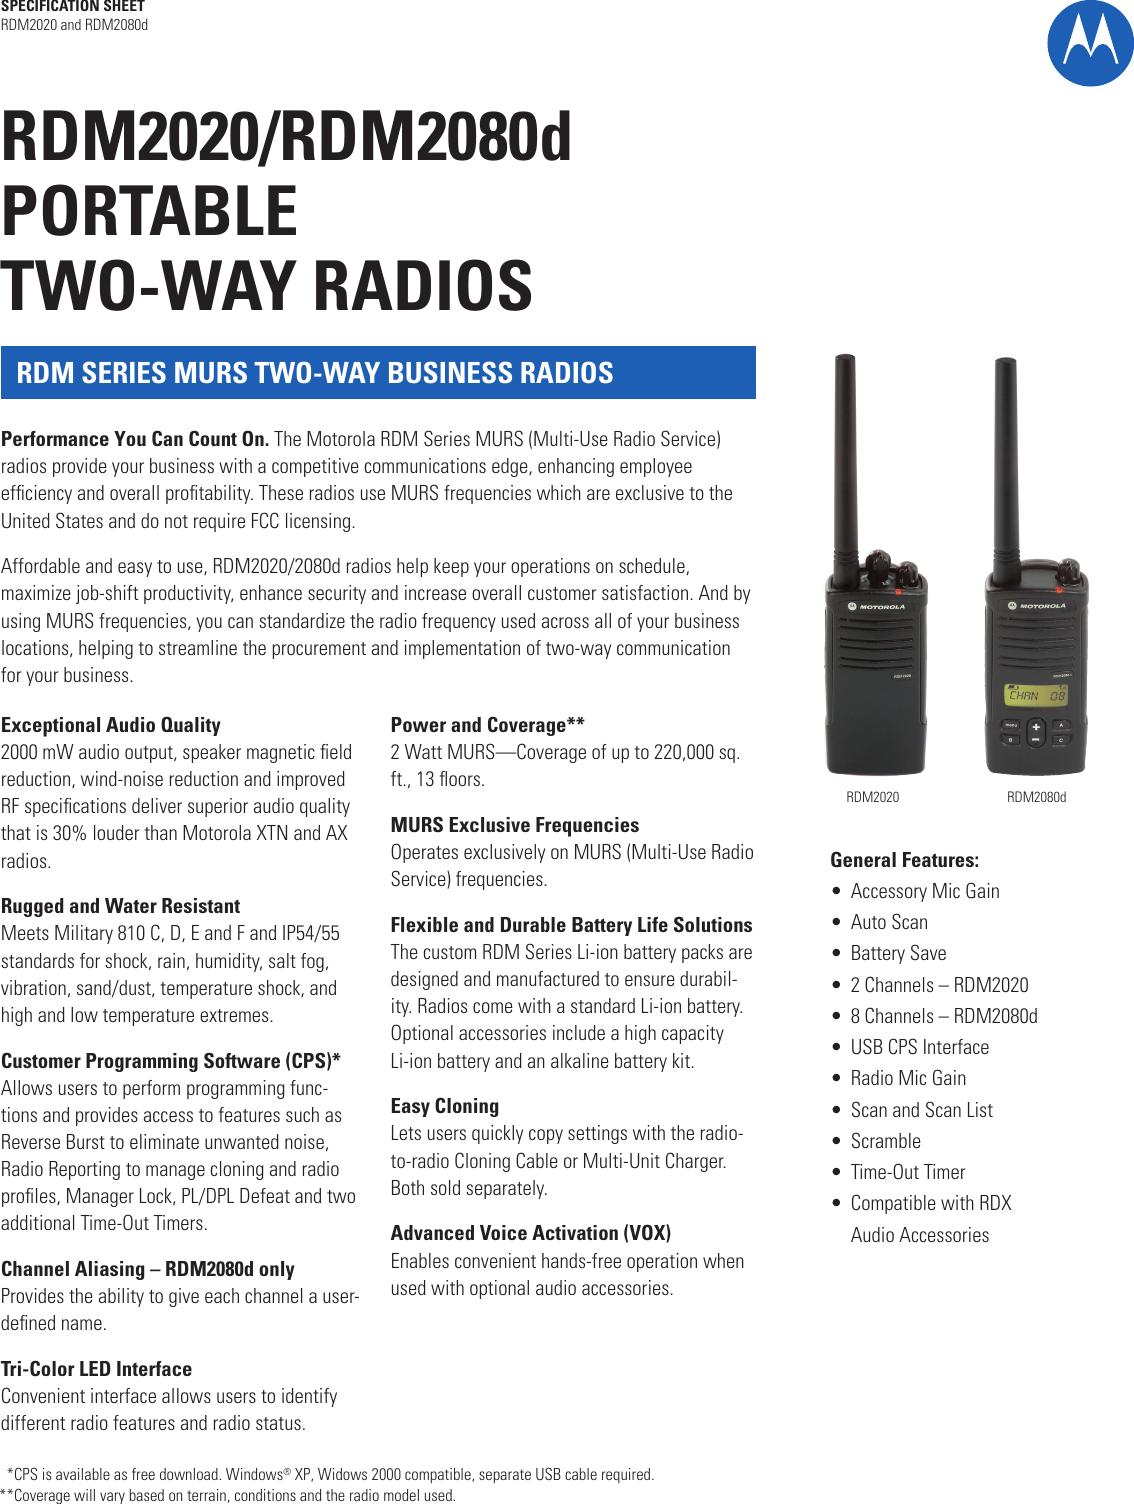 Motorola Rdx Series 2 Watt Murs 8 Channel Rdm2080D Users Manual